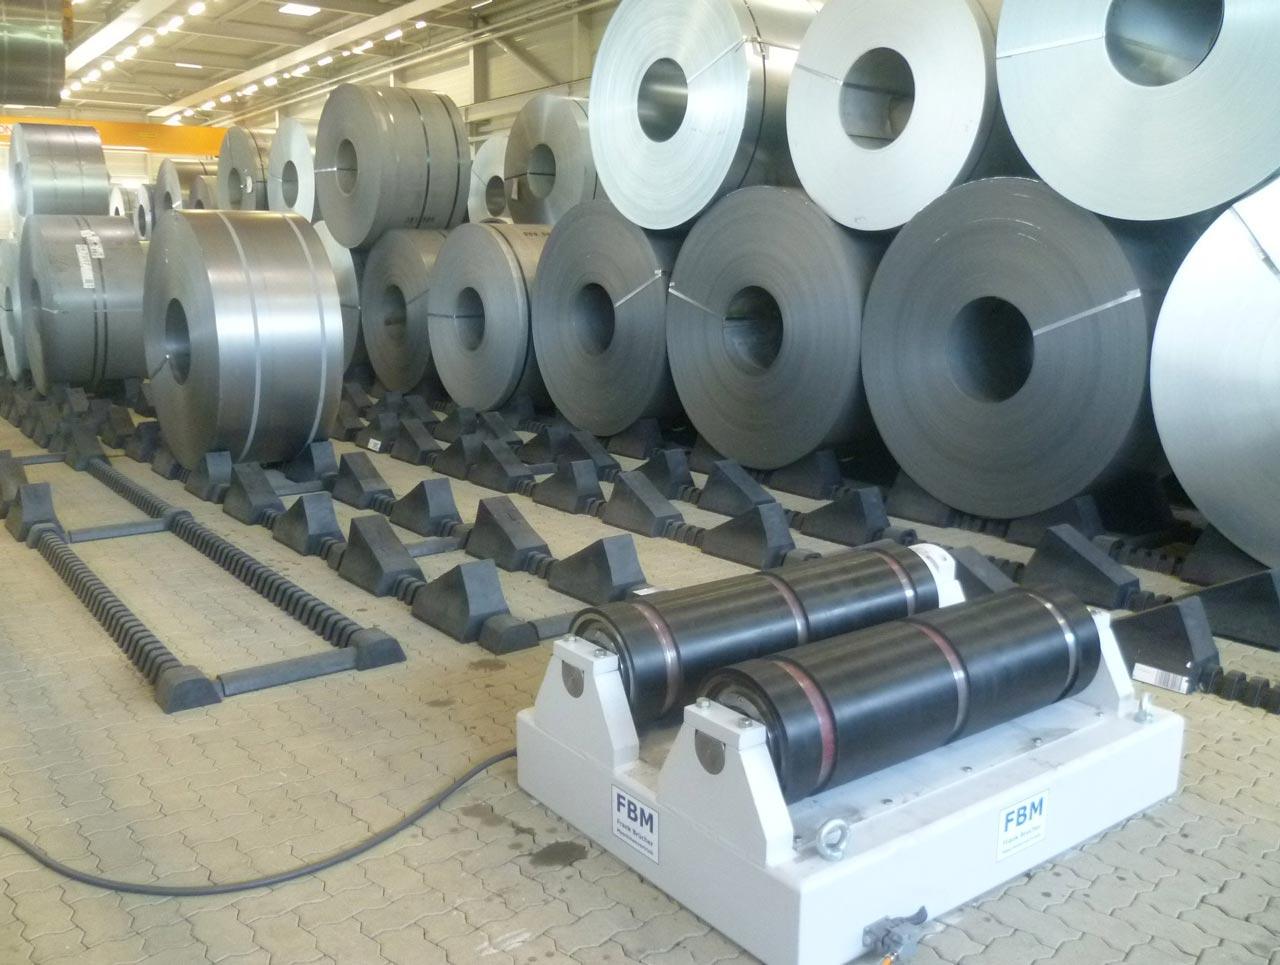 Coilprobenentnahme, coilvorbereitung, coil probe entnehmen, coilwender, coil wenden, coil drehvorrichtung, coil abwickeln, coil prüfen, coil drehen, coilvorbereitungsstation, coil drehstation, coilhandling, blechprobe, coilprobe, cvs, coilbock, coilabrollbock, Probenentnahme